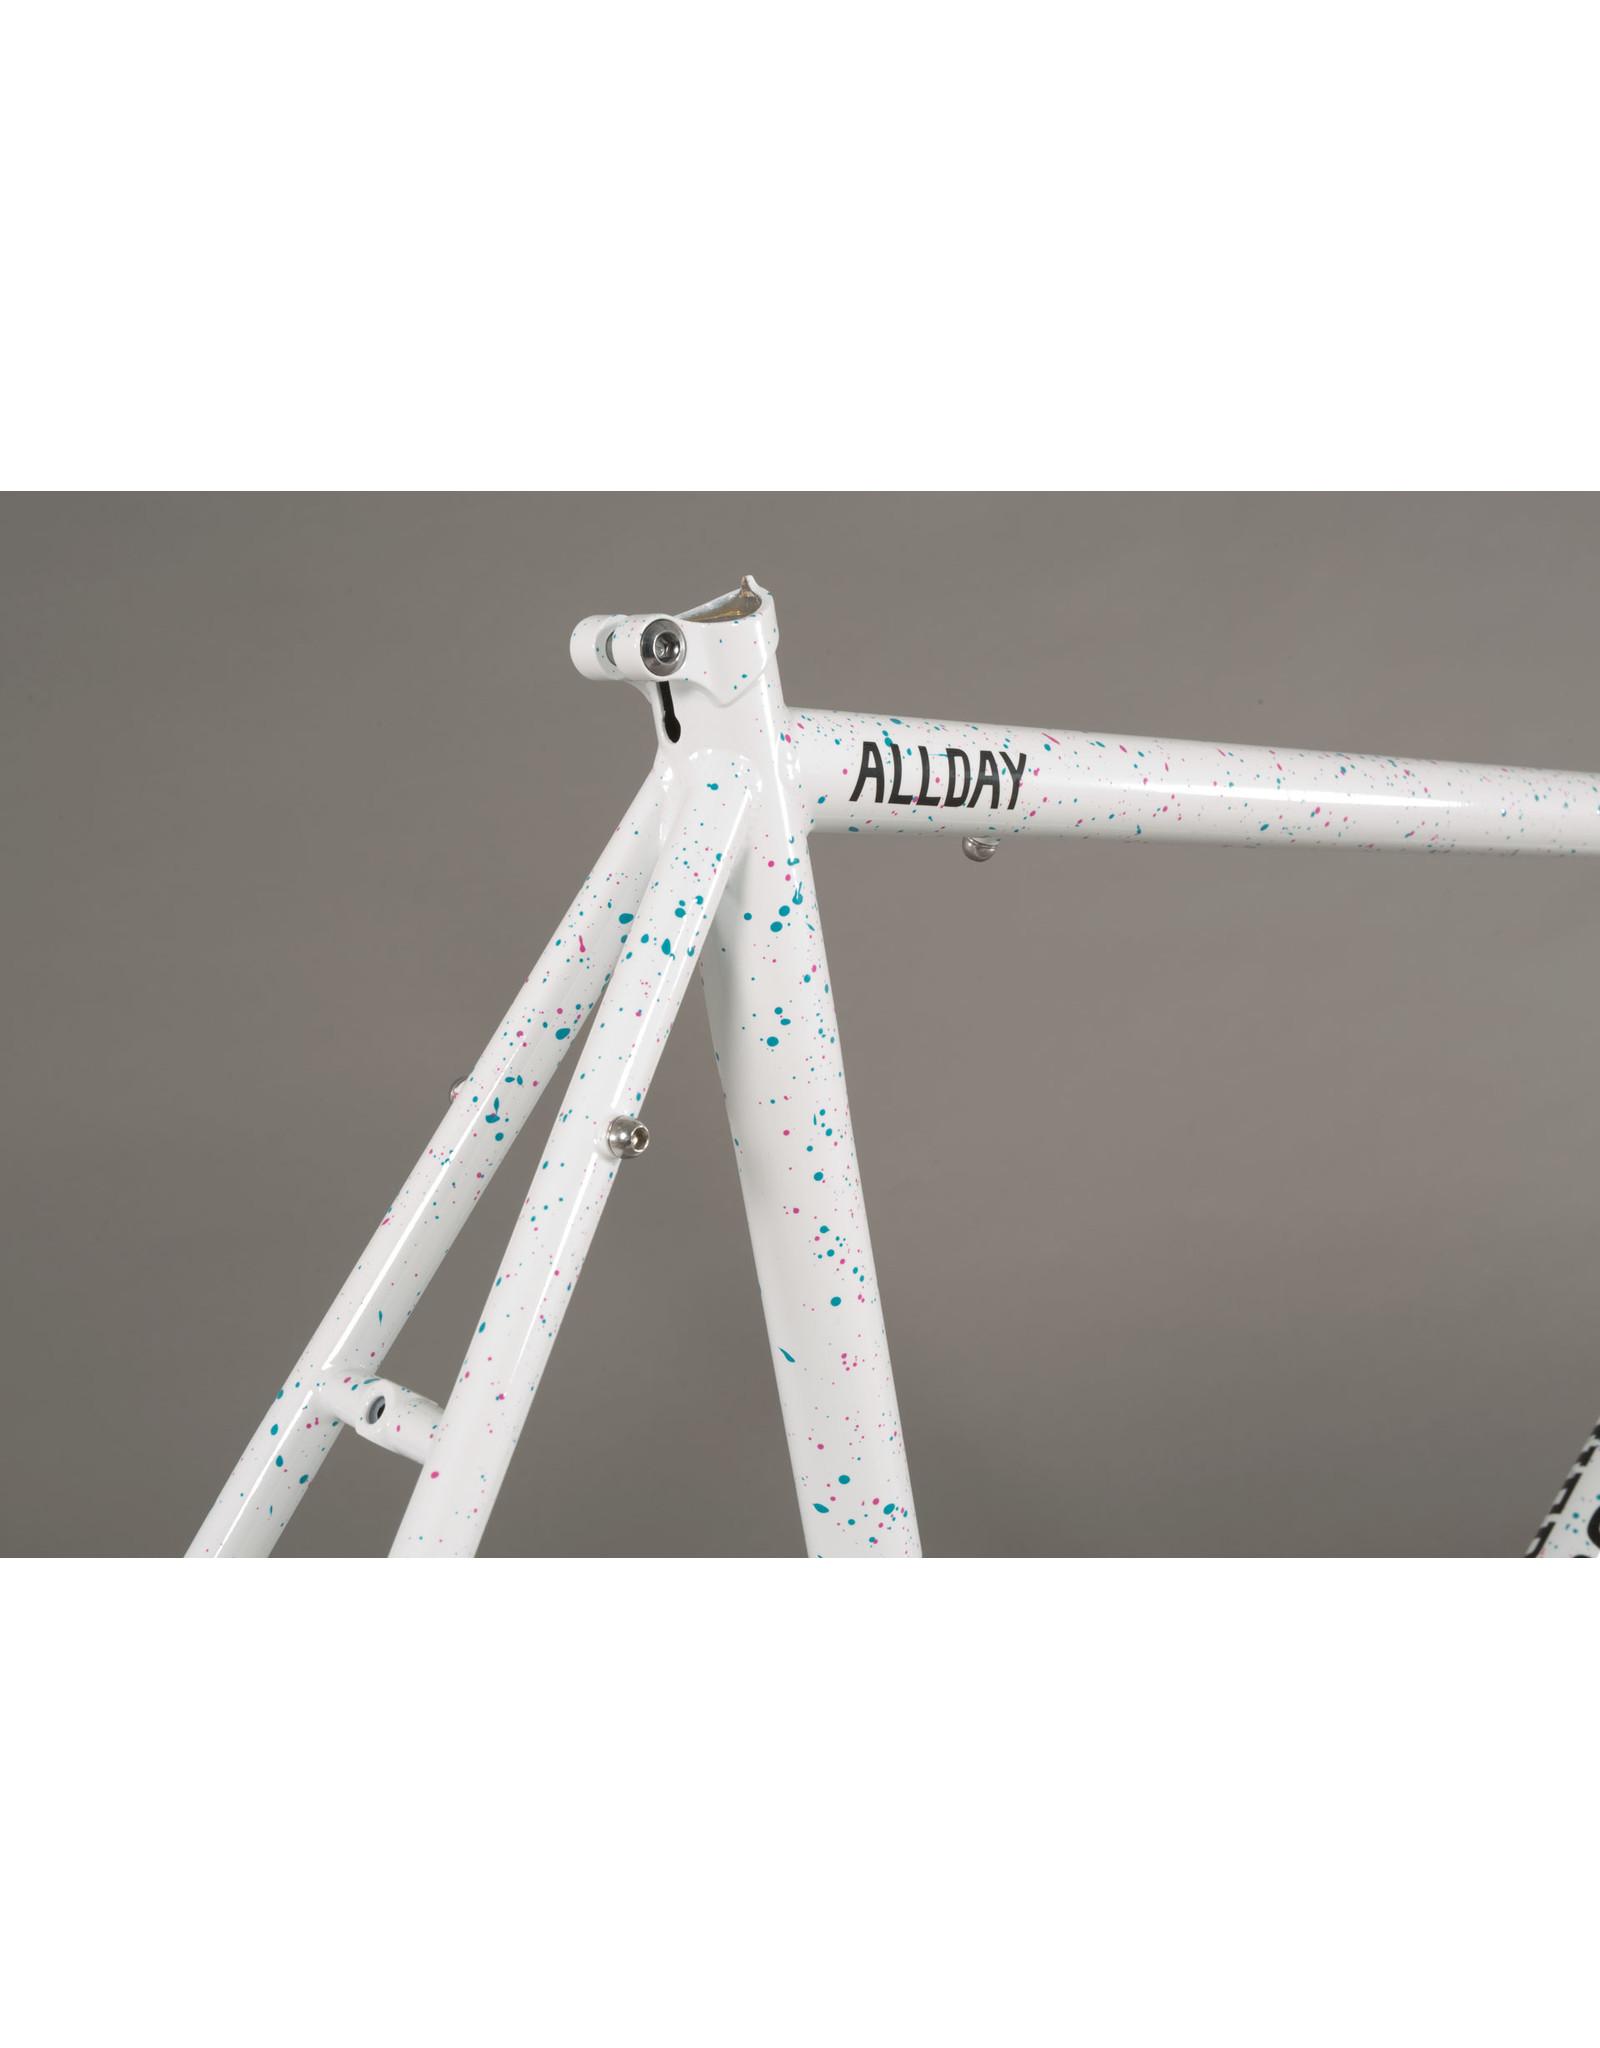 Brother Cycles - AllDay Frameset 2019 - Splatter